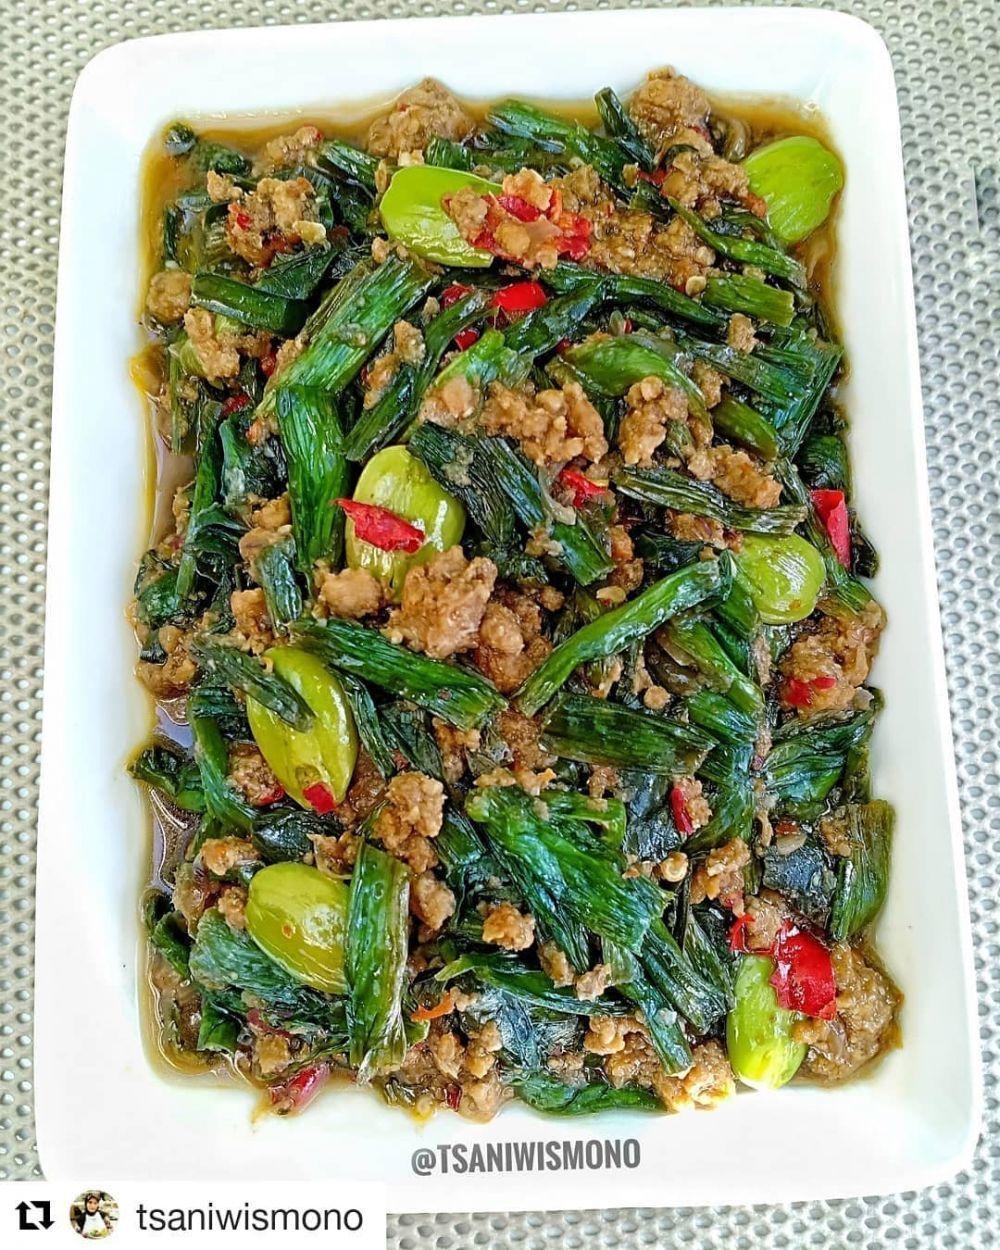 Resep Sayur Genjer C 2020 Brilio Net Sayuran Resep Resep Masakan Indonesia